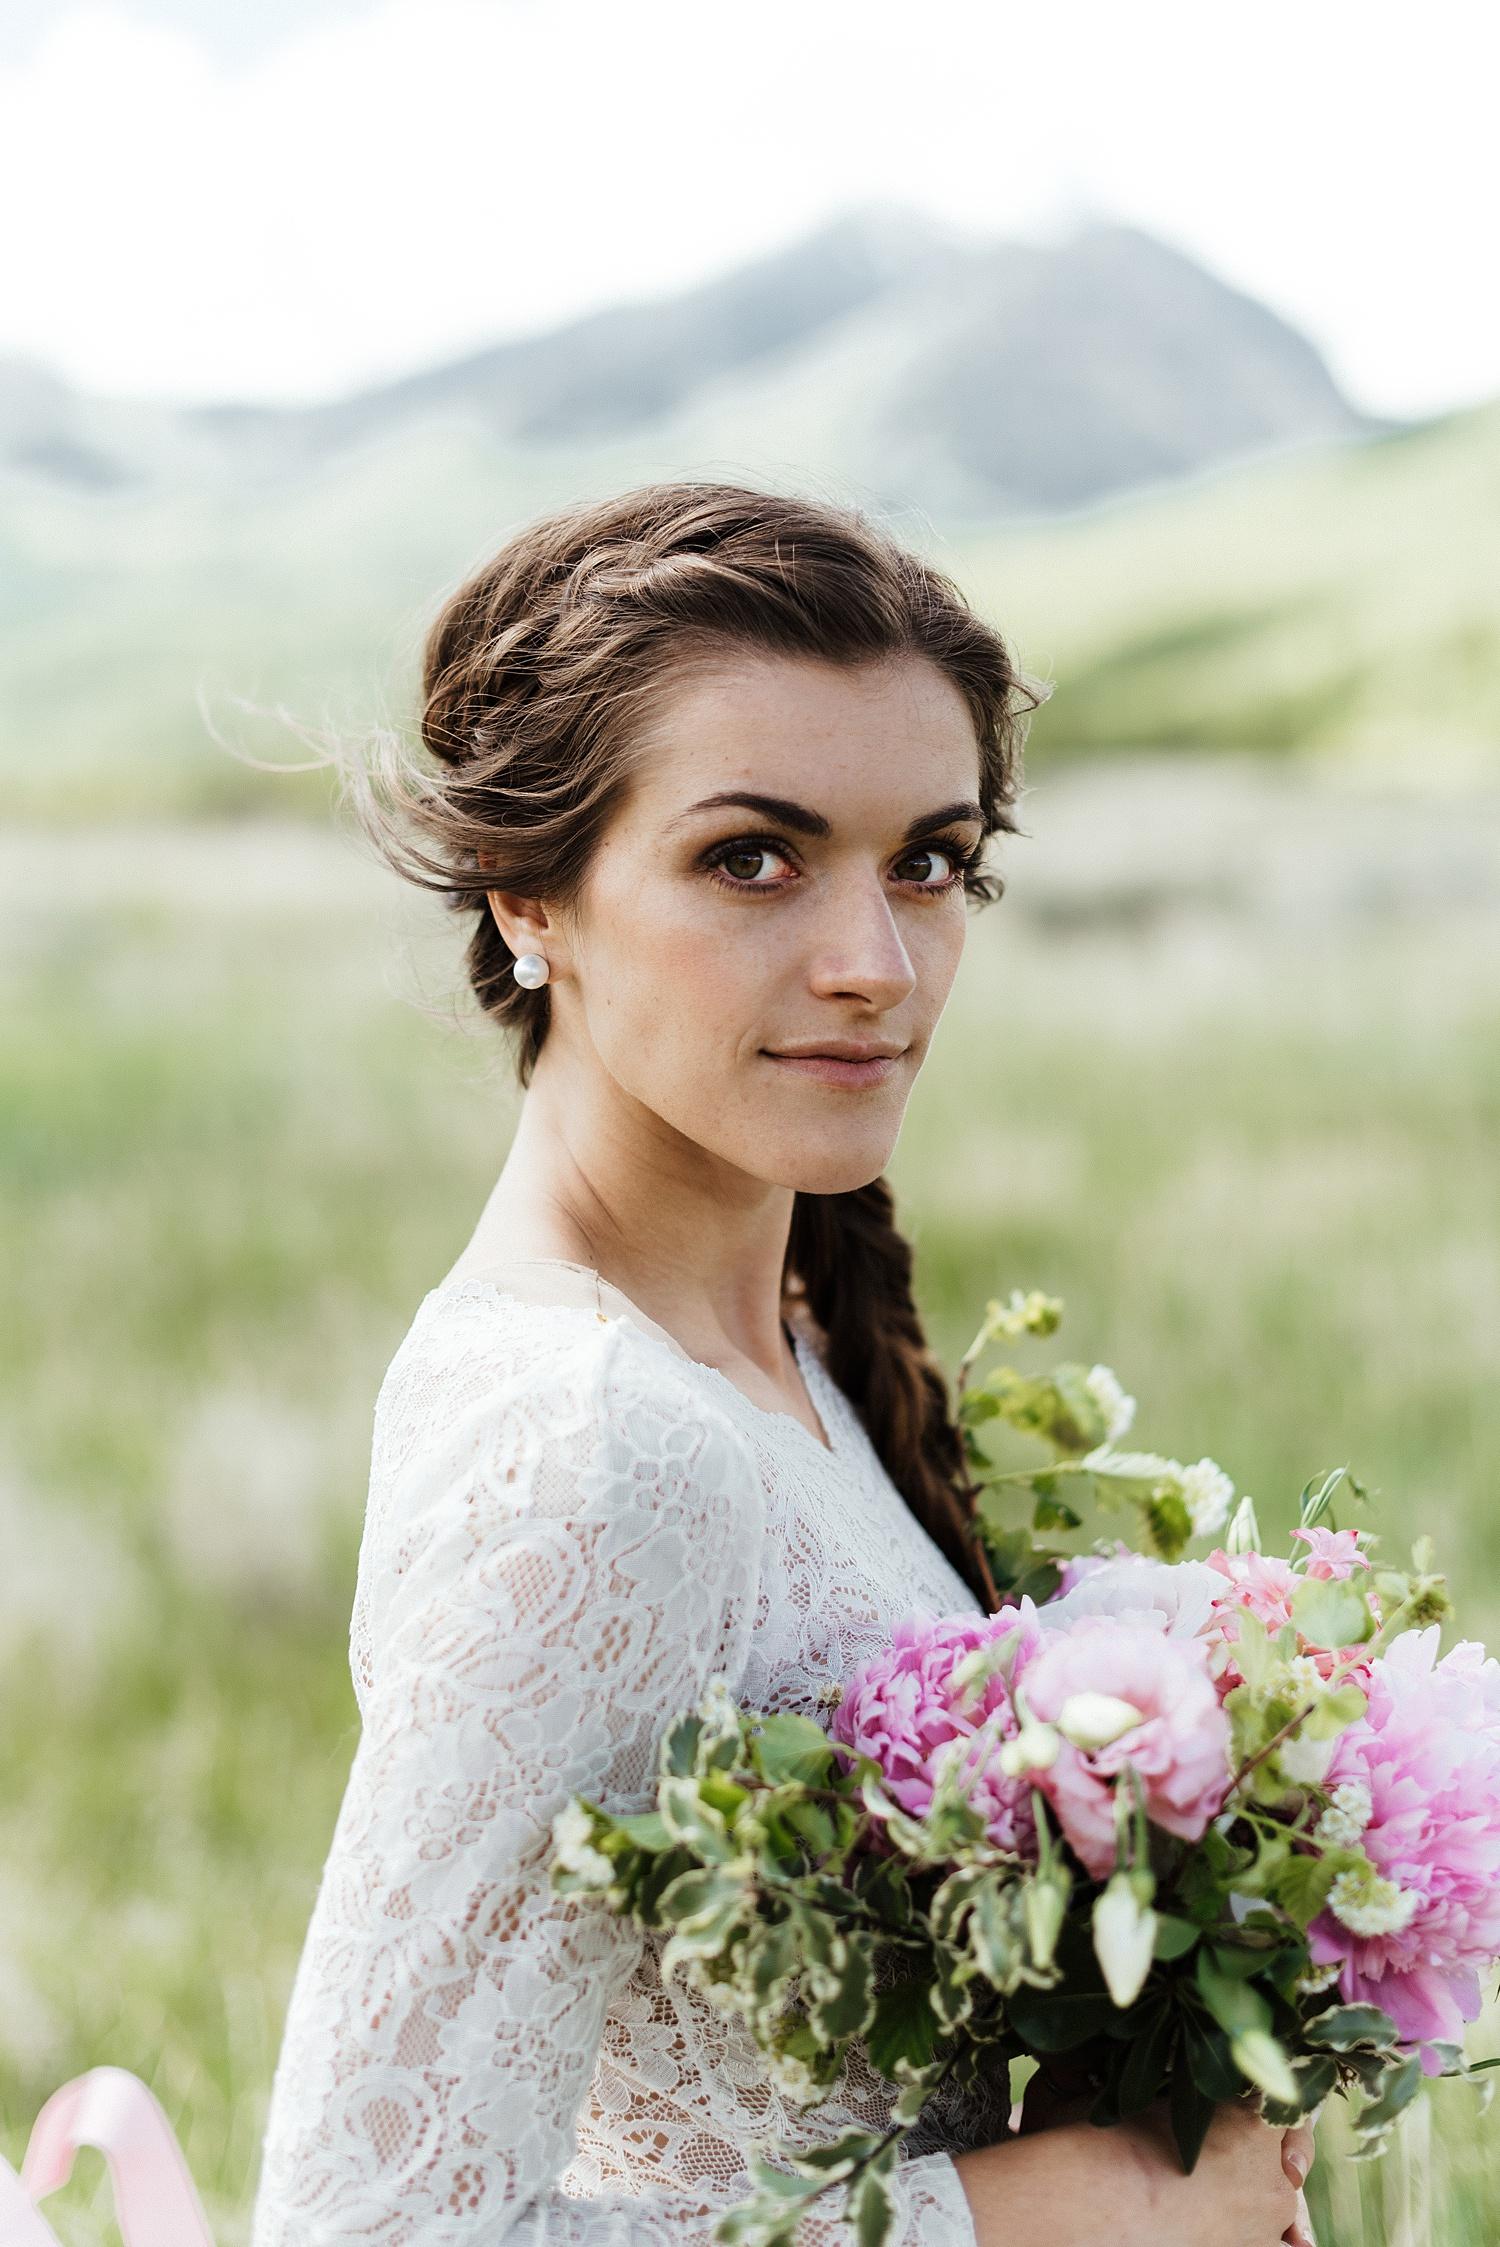 Zandra Barriga Photo - Spring Florals_0004.jpg